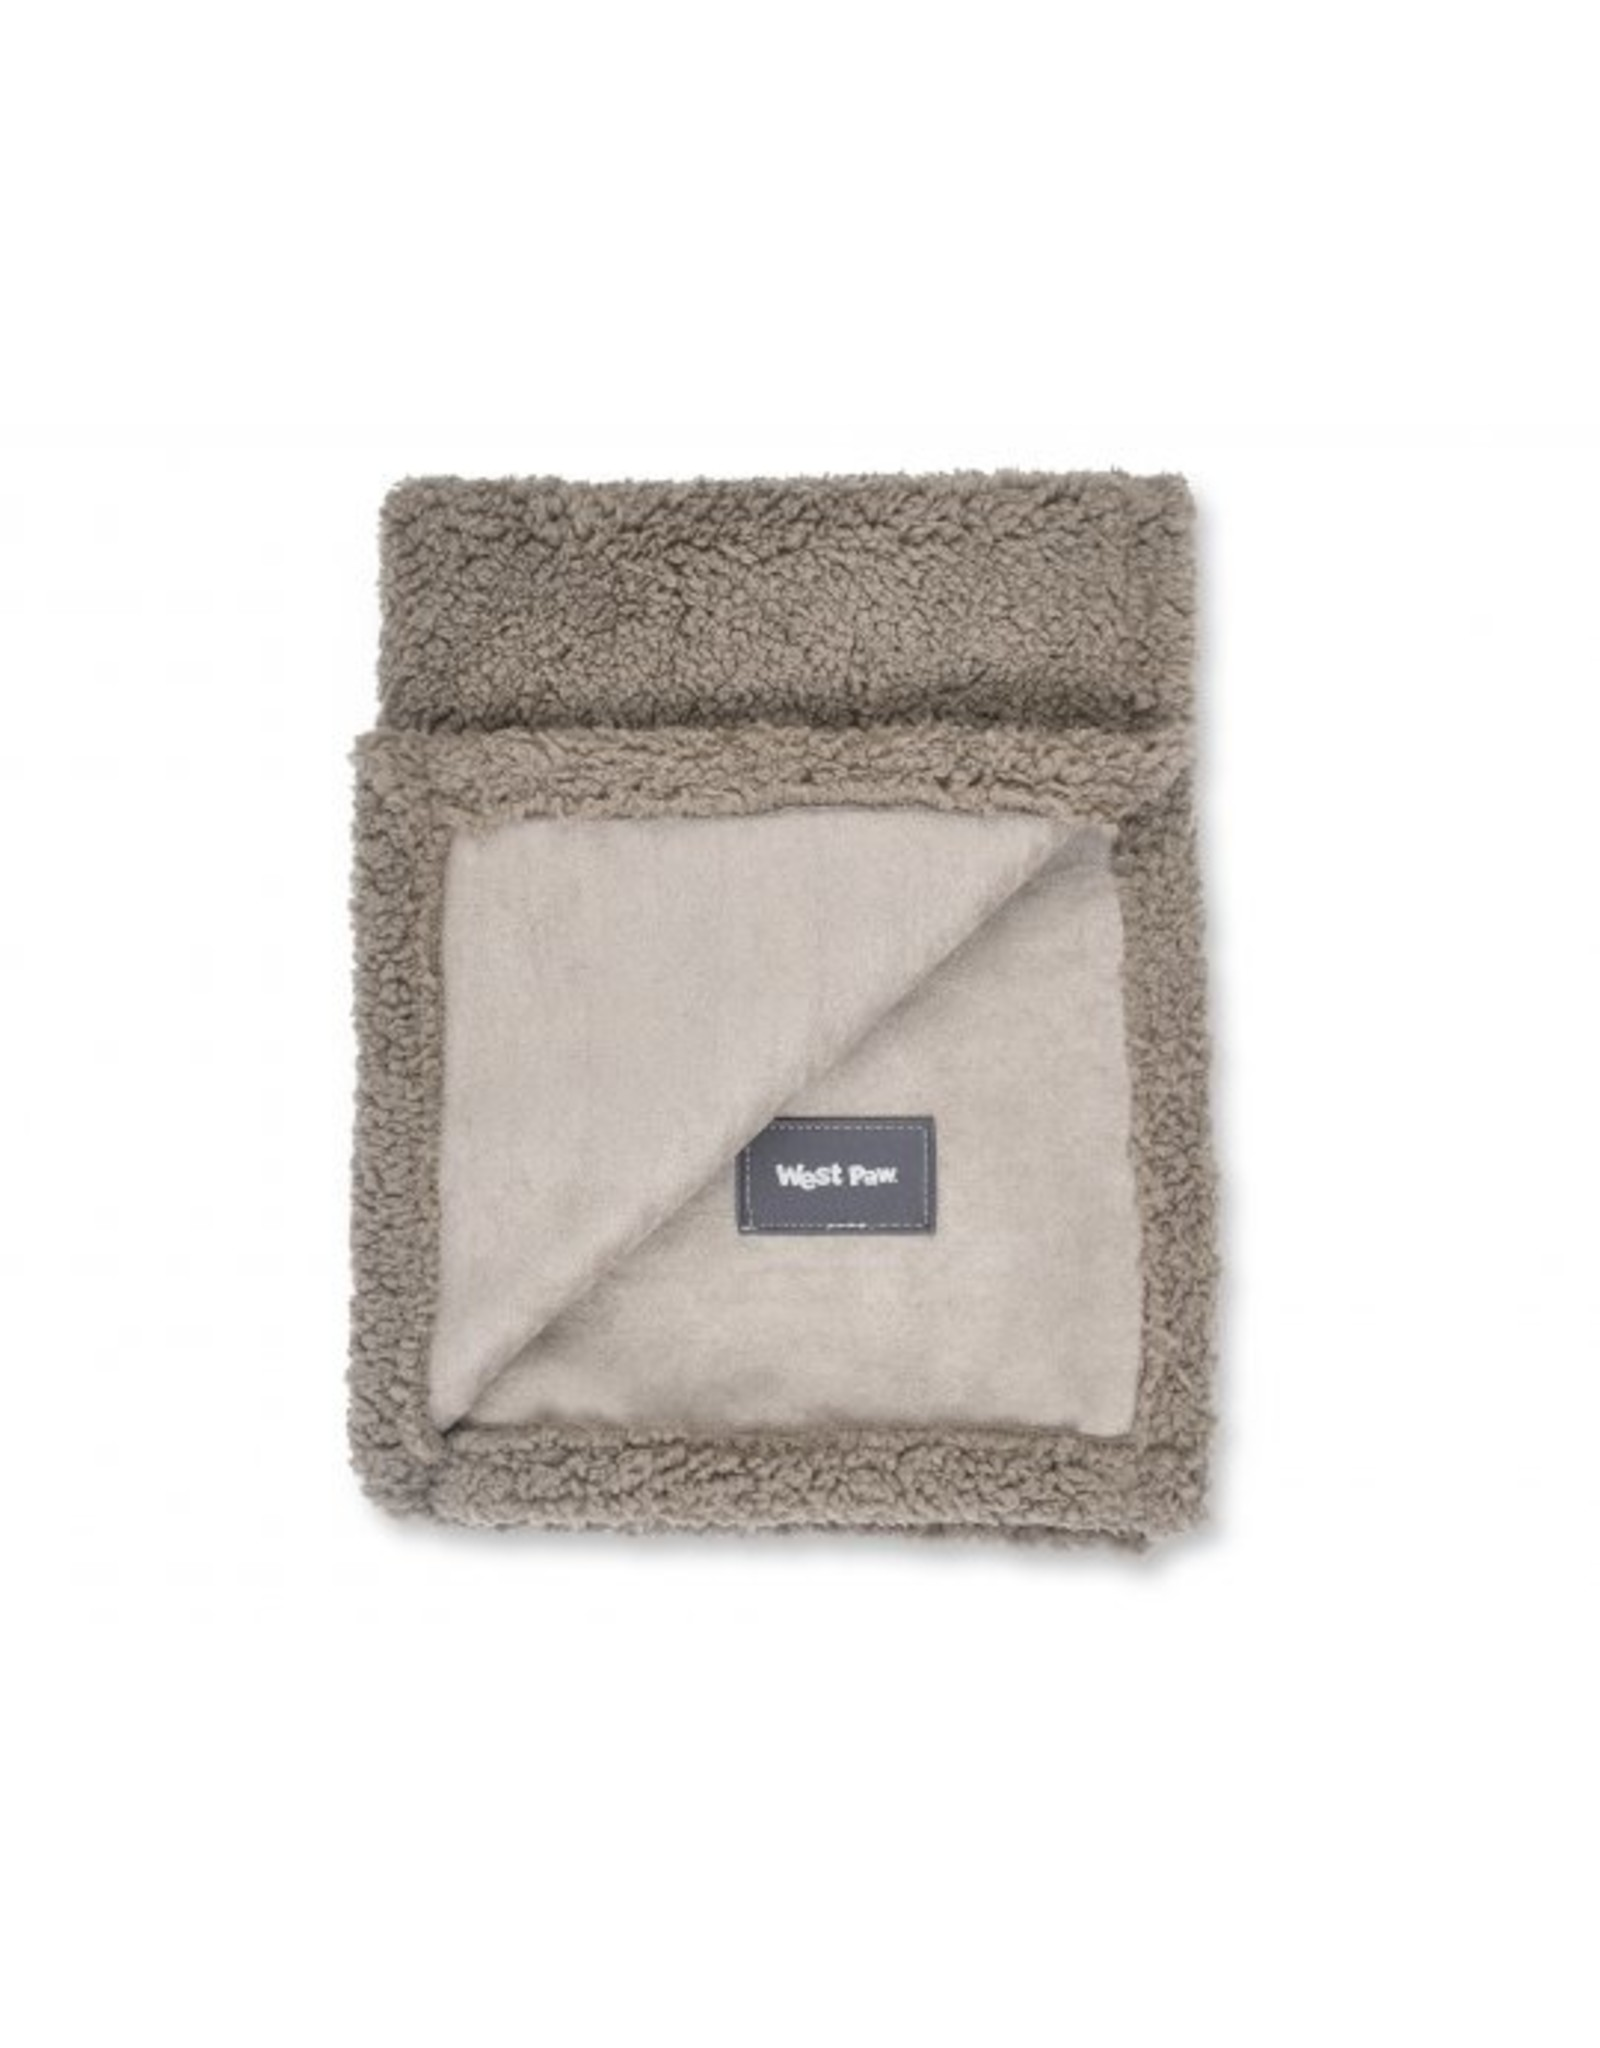 West Paw Designs Westpaw: Big Sky Blanket M 56x38 Oatmeal